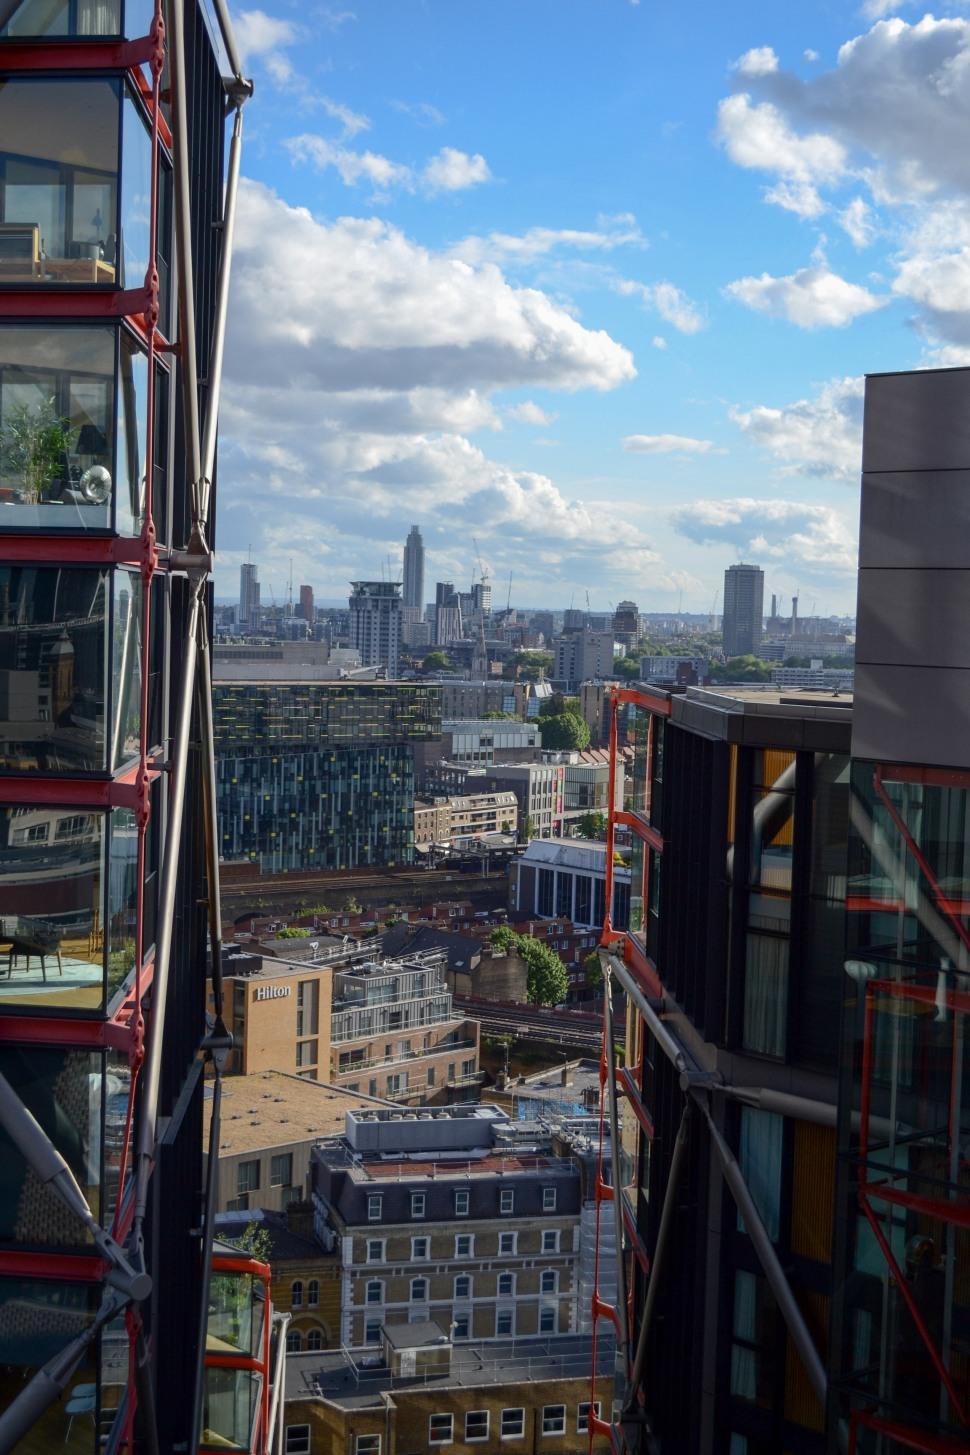 London_tate modern_platform_6